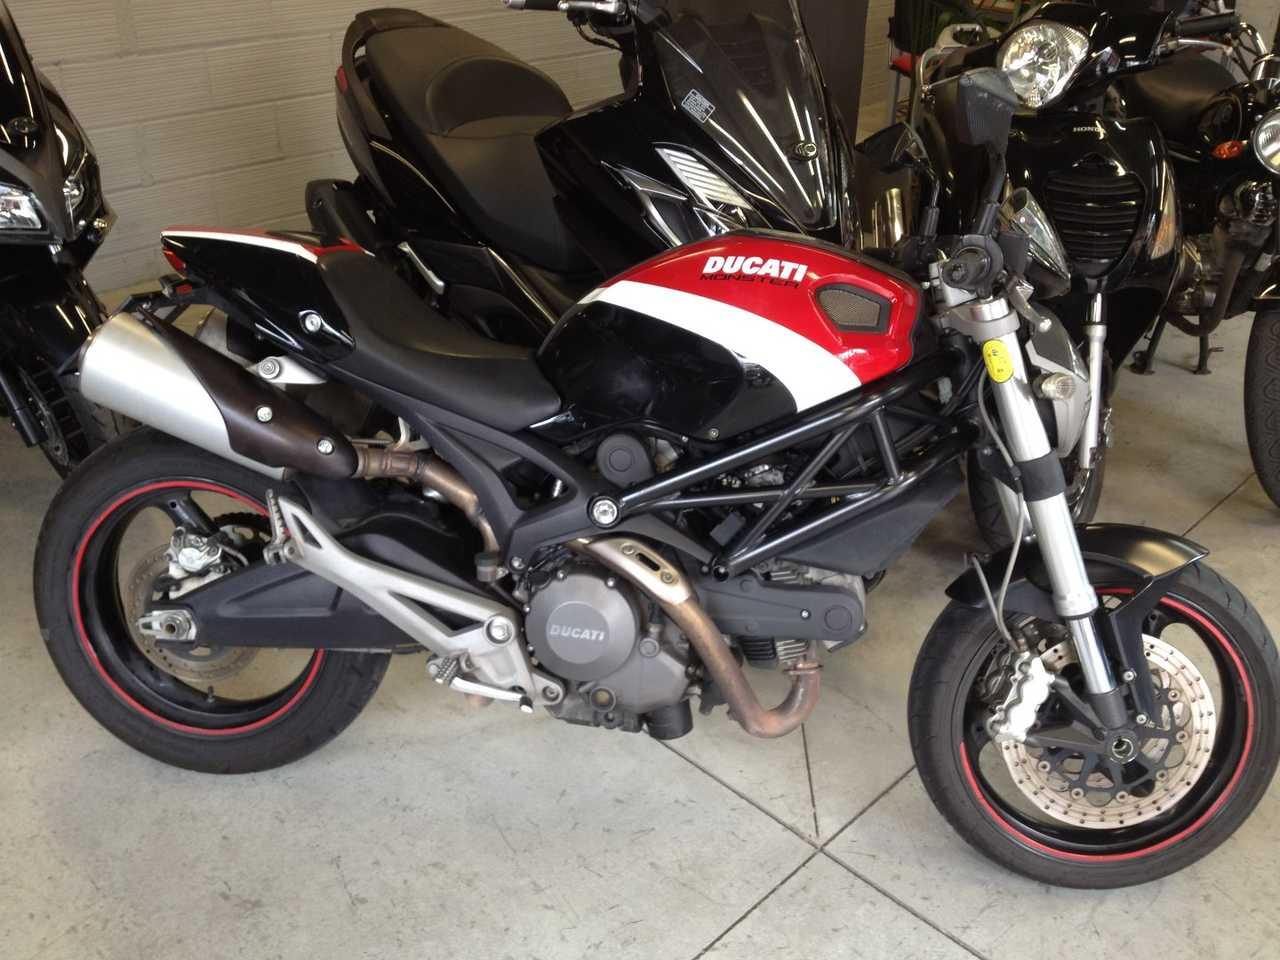 Ducati Monster 696 Versión CORSA  - Foto 1